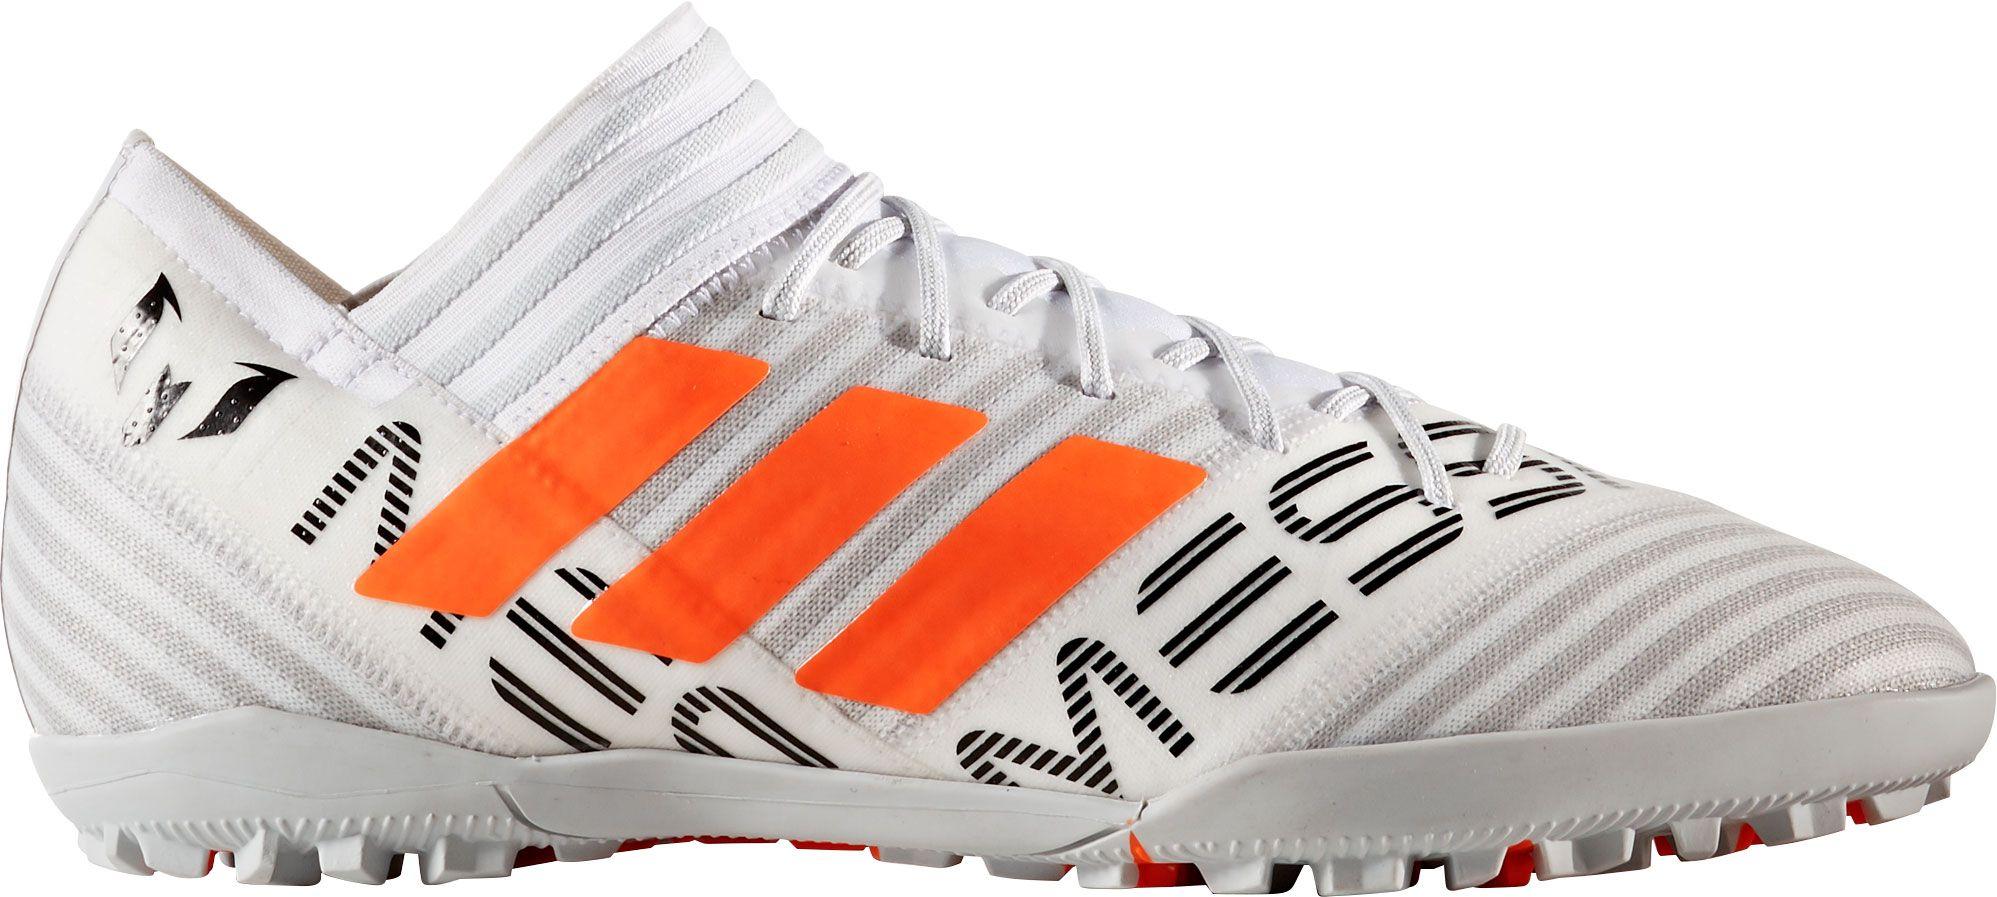 Product Image · adidas Men's Nemeziz Messi Tango 17.3 Turf Soccer Cleats